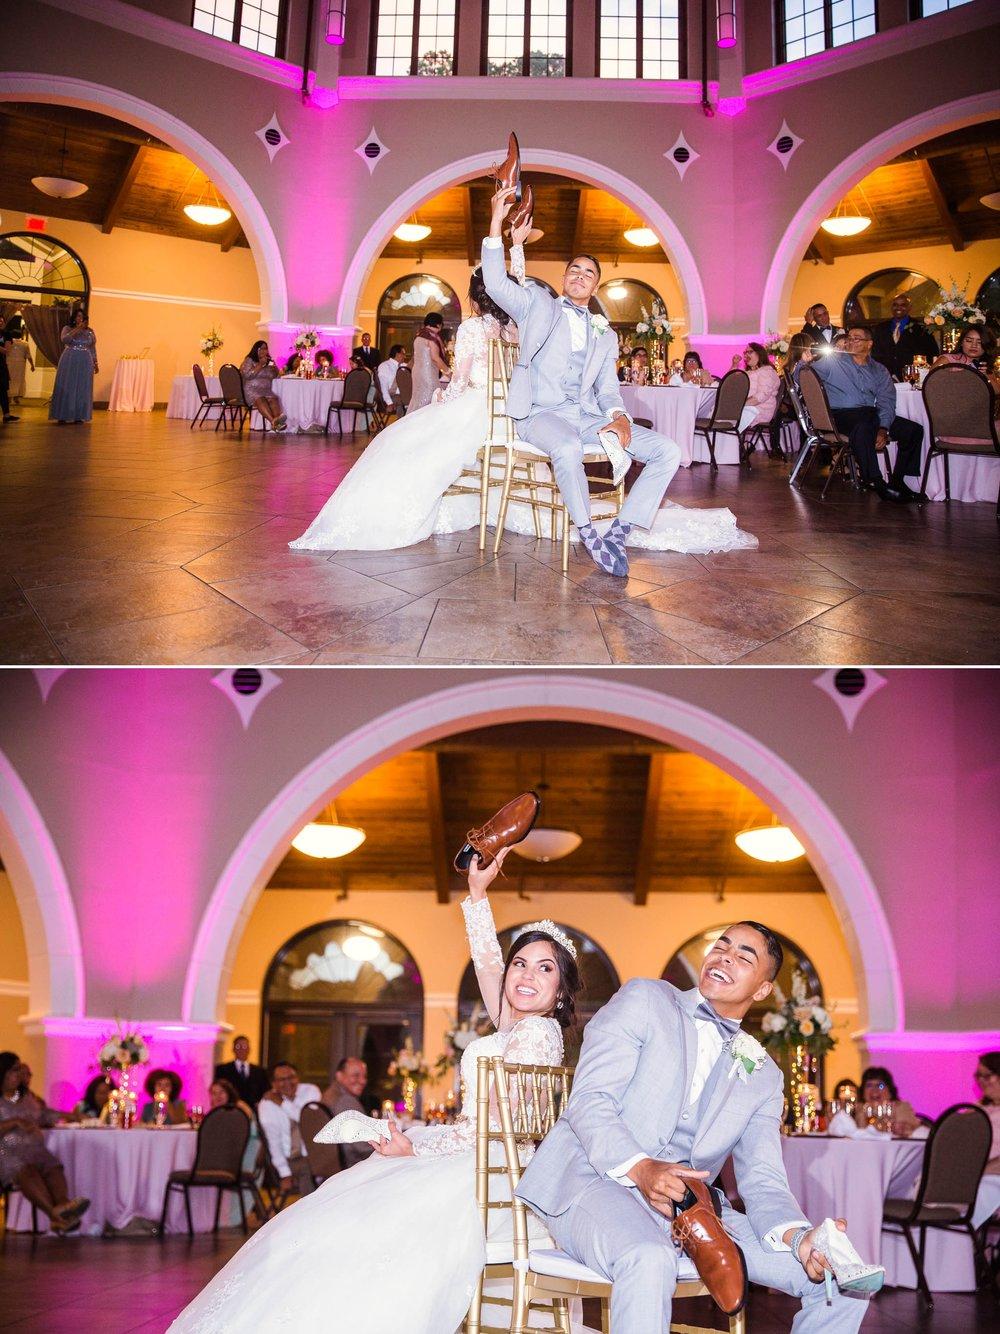 The Shoe Game - Yansi + Eddie - Wedding at Cape Fear Botanical Garden - Fayetteville North Carolina Photographer